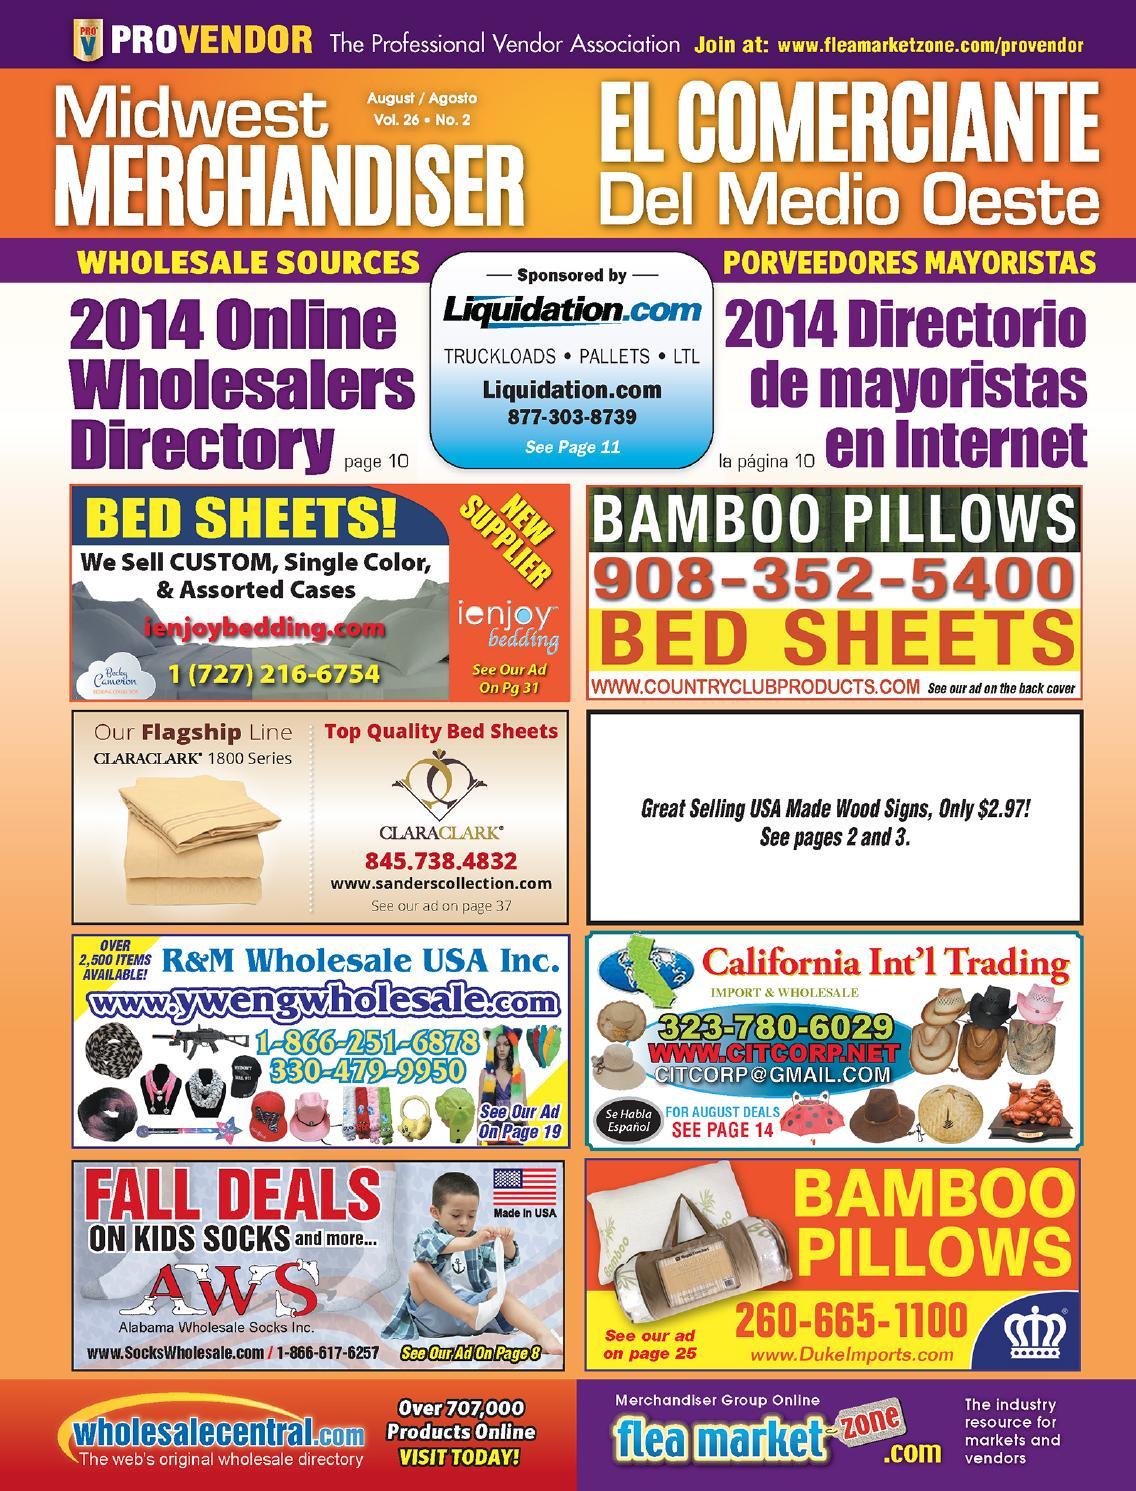 2fd2c0b428e Midwest Merchandiser 08-14 by Sumner Communications - issuu